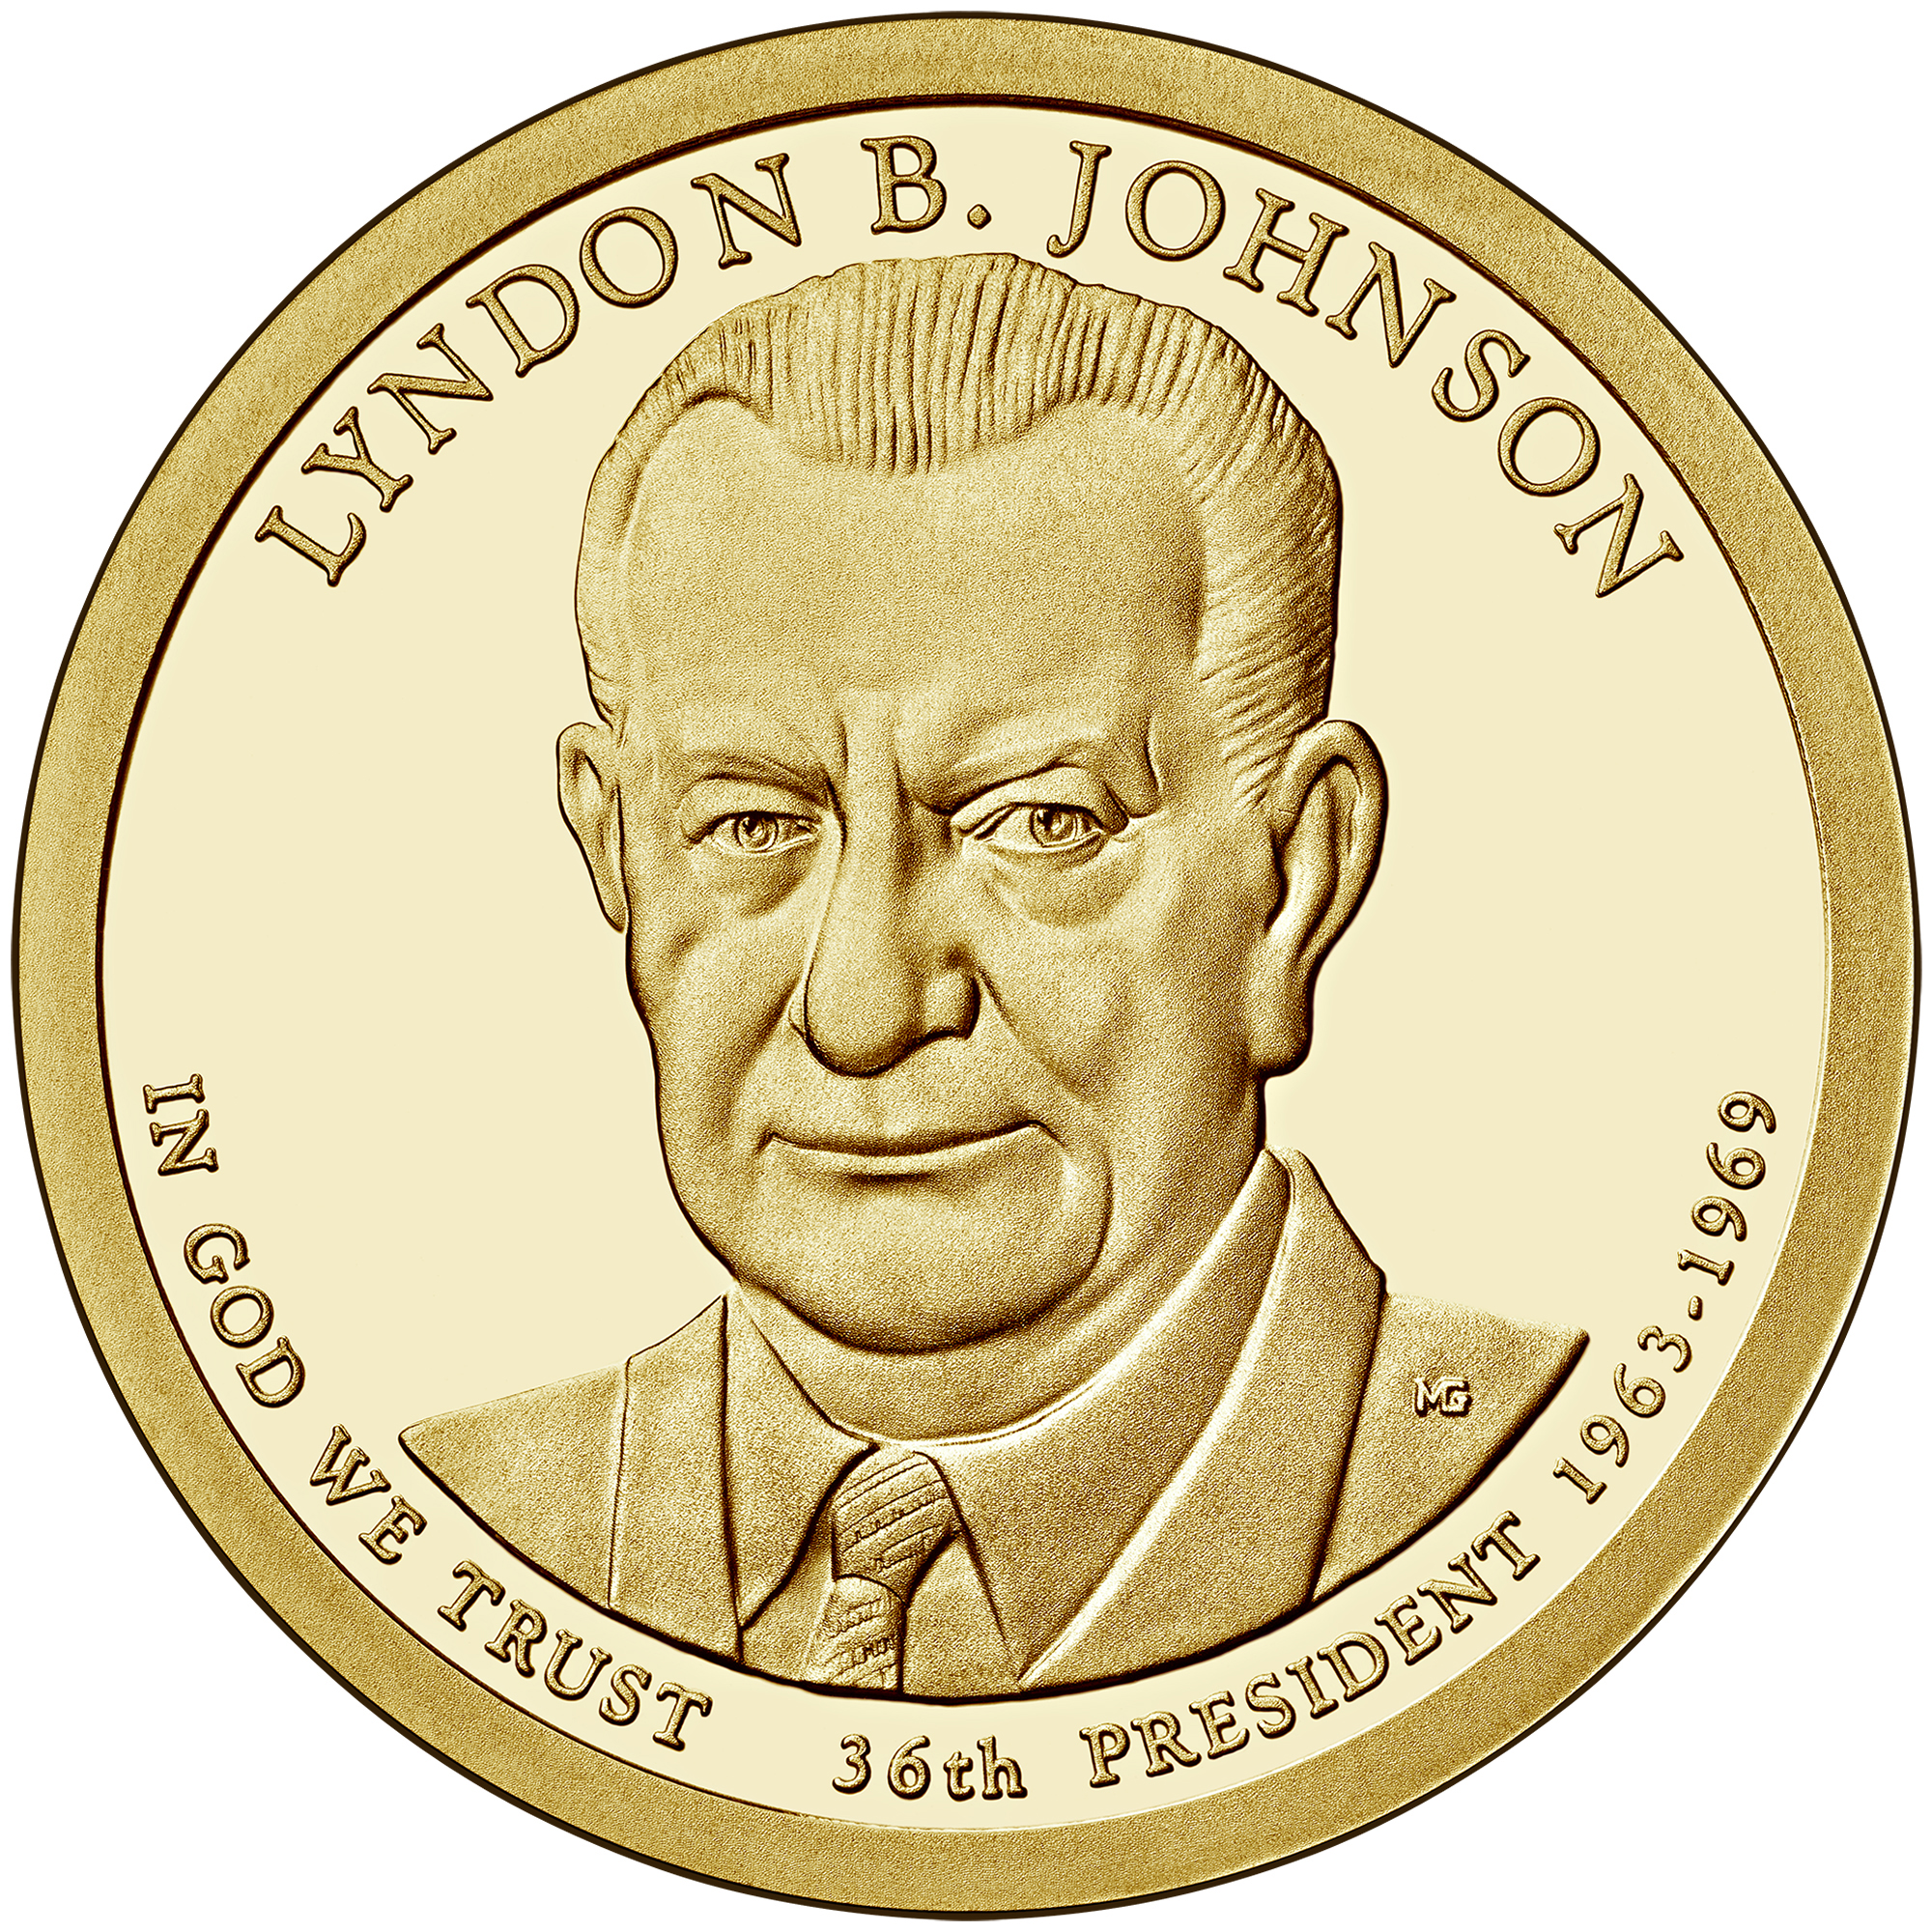 2015 Presidential Dollar Coin Lyndon B. Johnson Proof Obverse